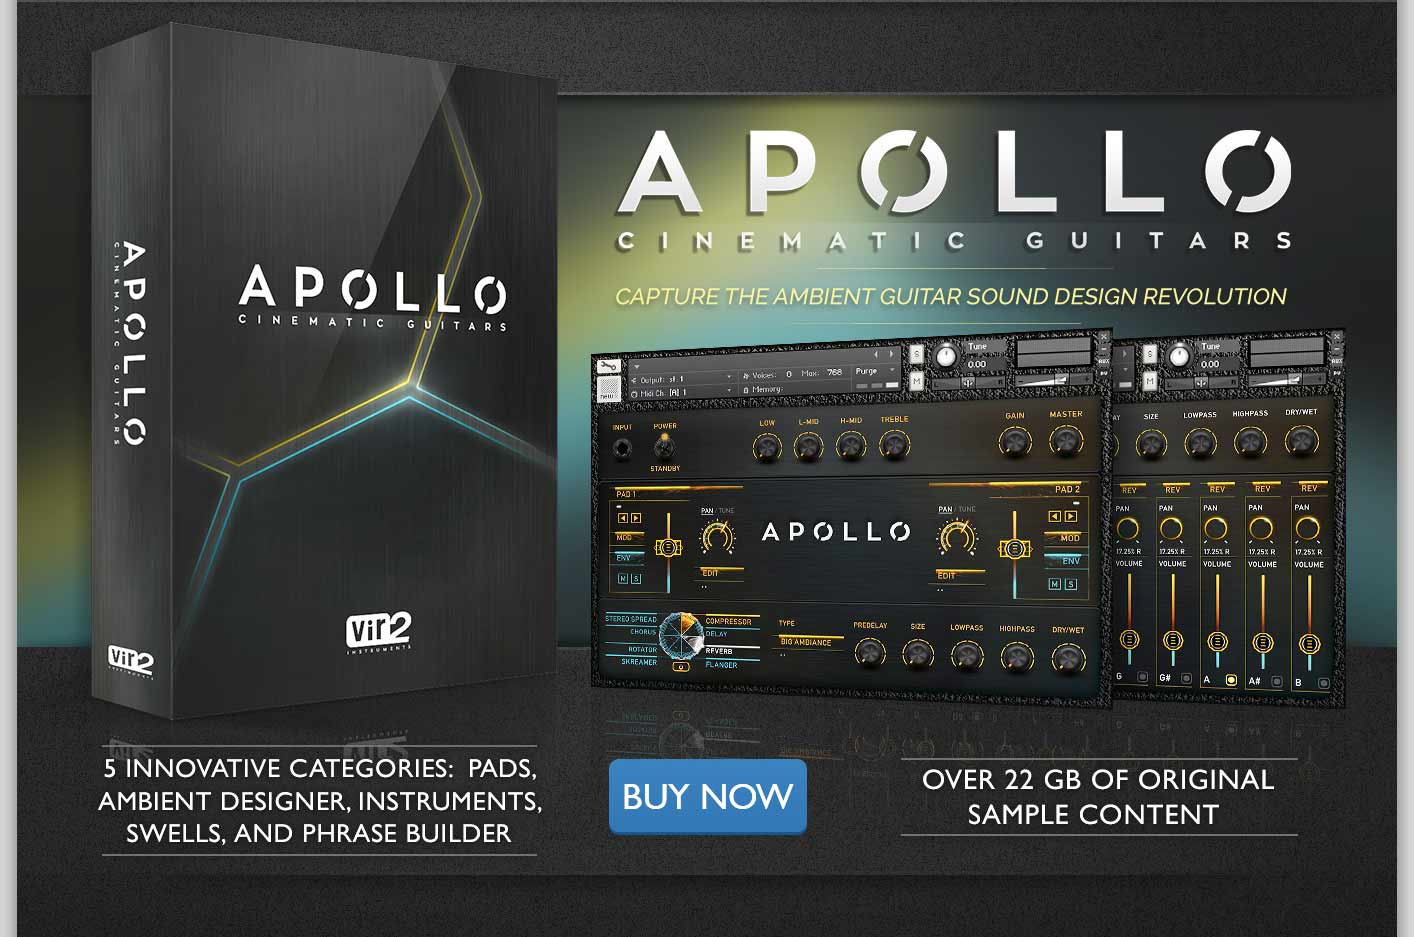 Apollo Cinematic Guitars